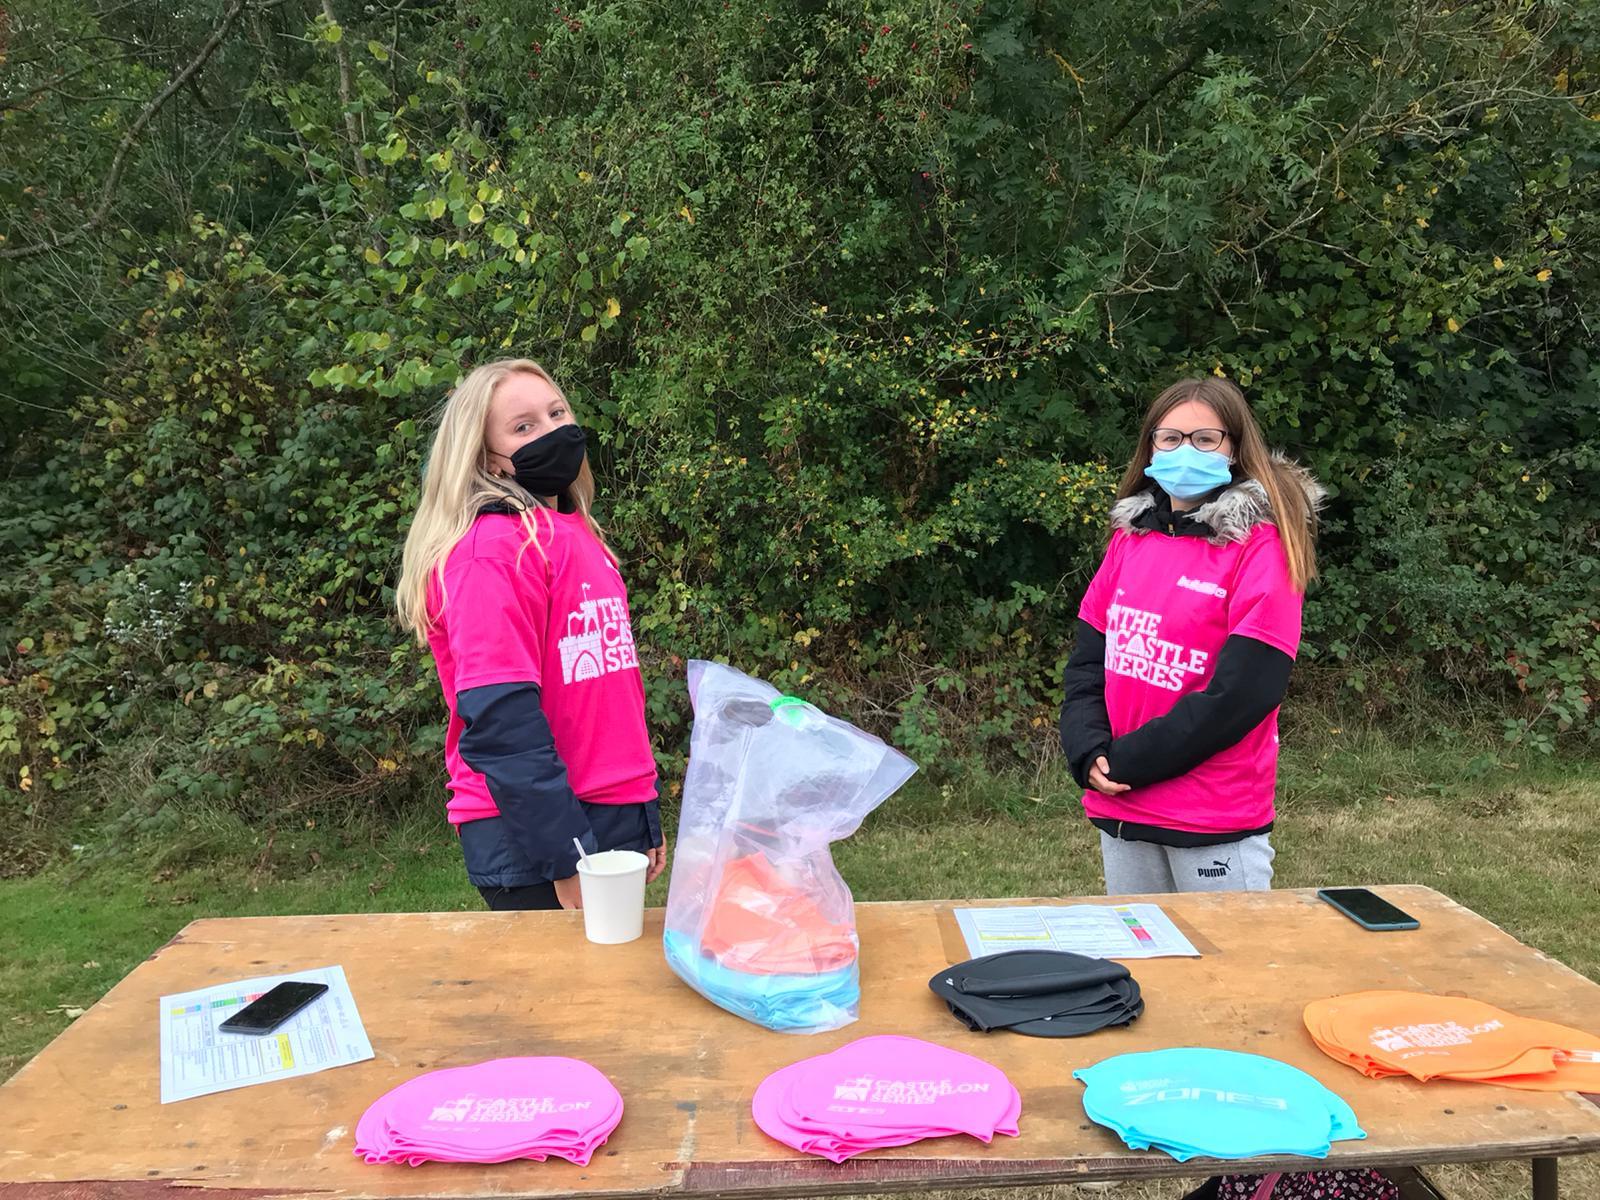 Tonbridge Grammar Girls A* Volunteering At Hever